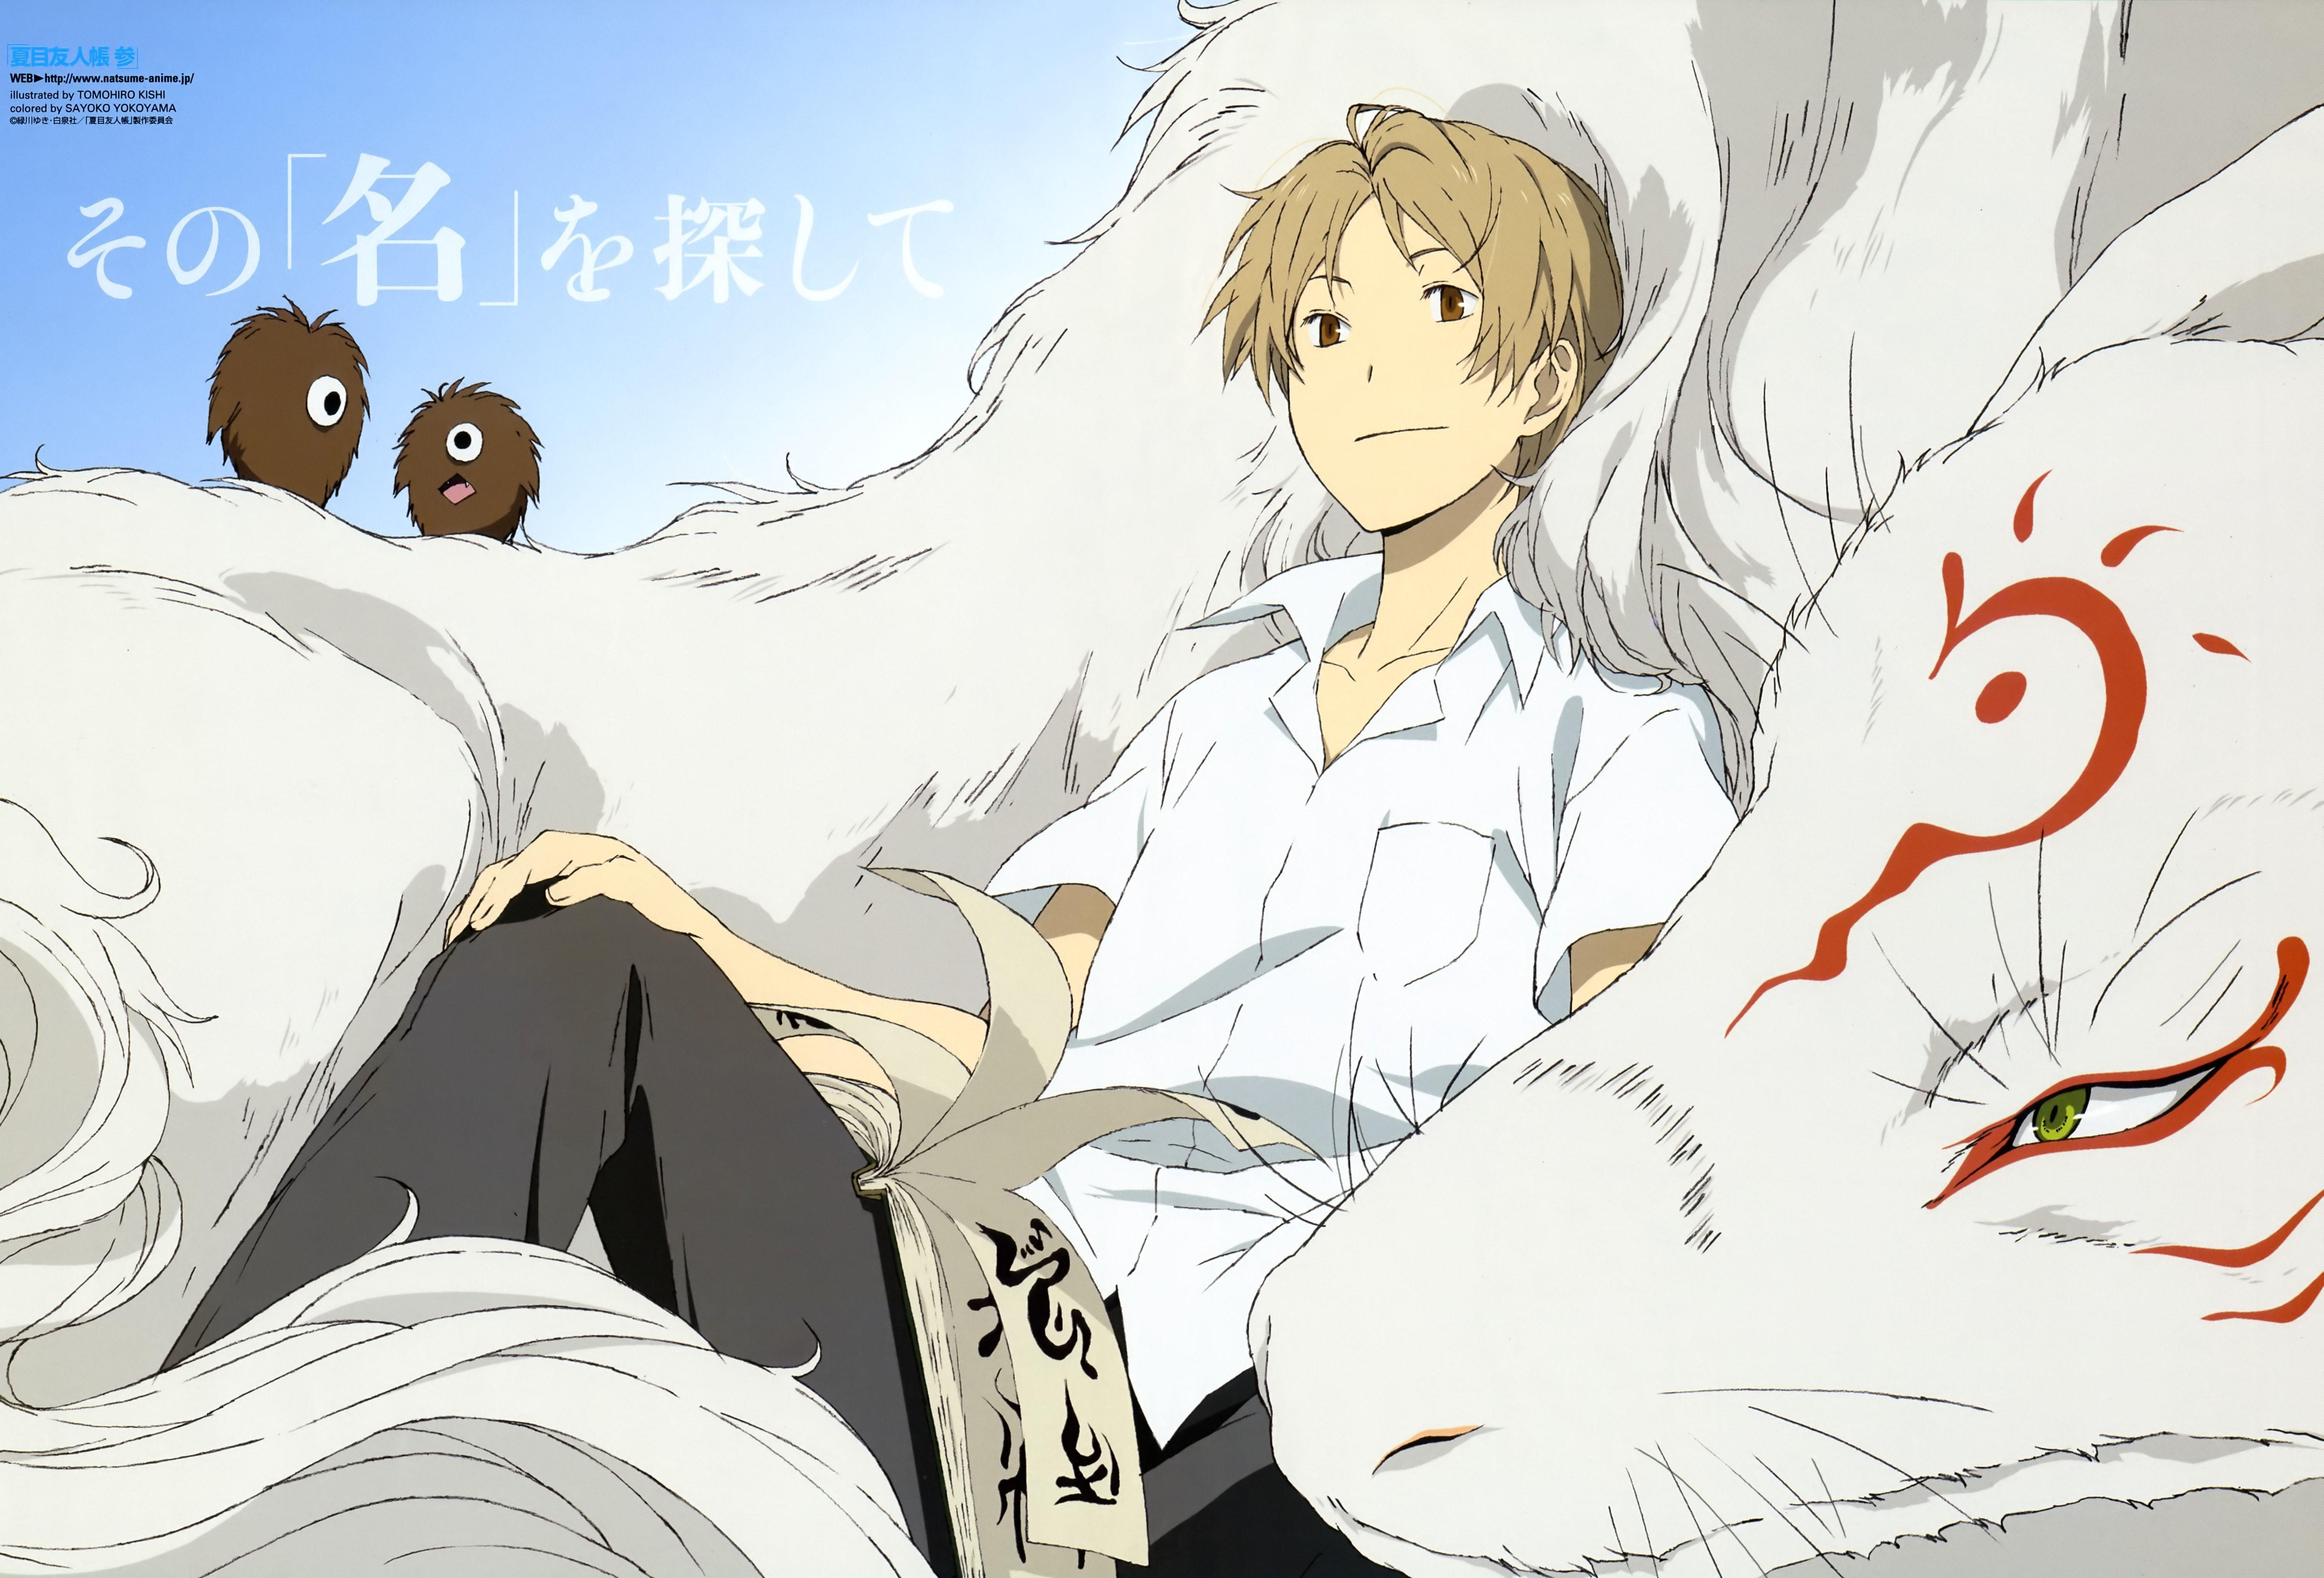 Natsumeyuujinchoufull735154 amour anime anime mangas